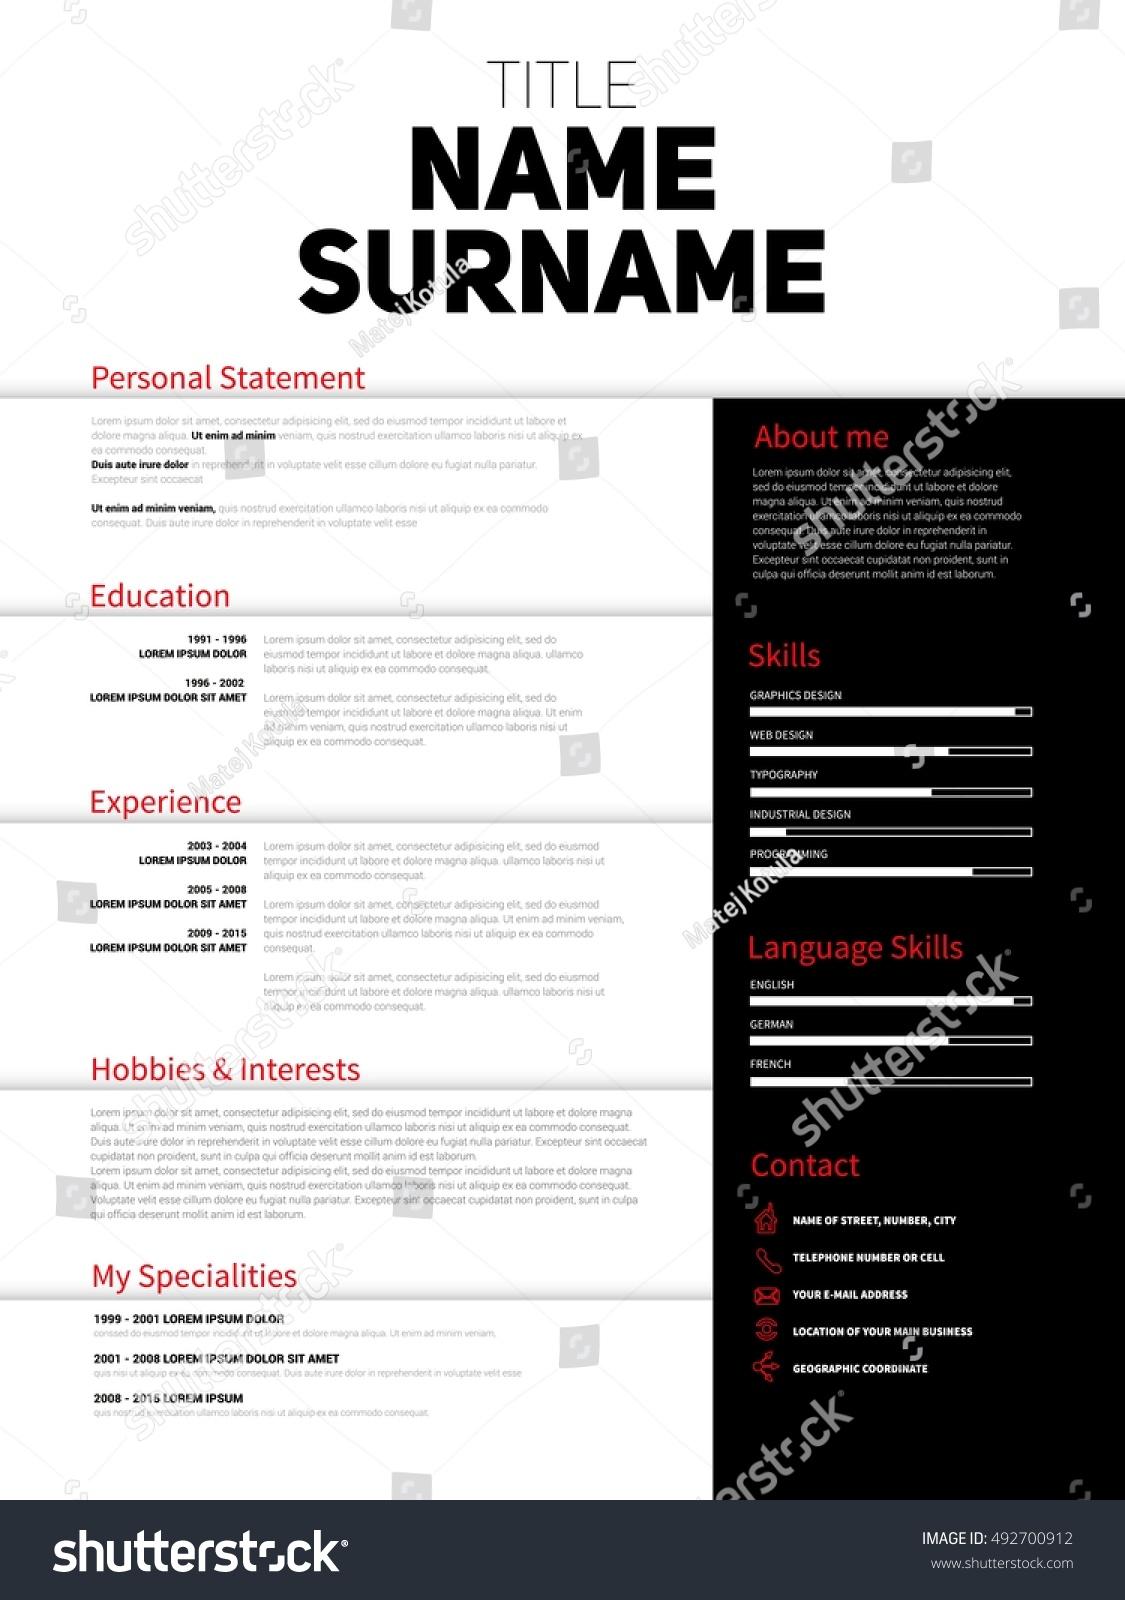 Resume Minimalist CV Resume Template Simple Stock Vector (Royalty ...